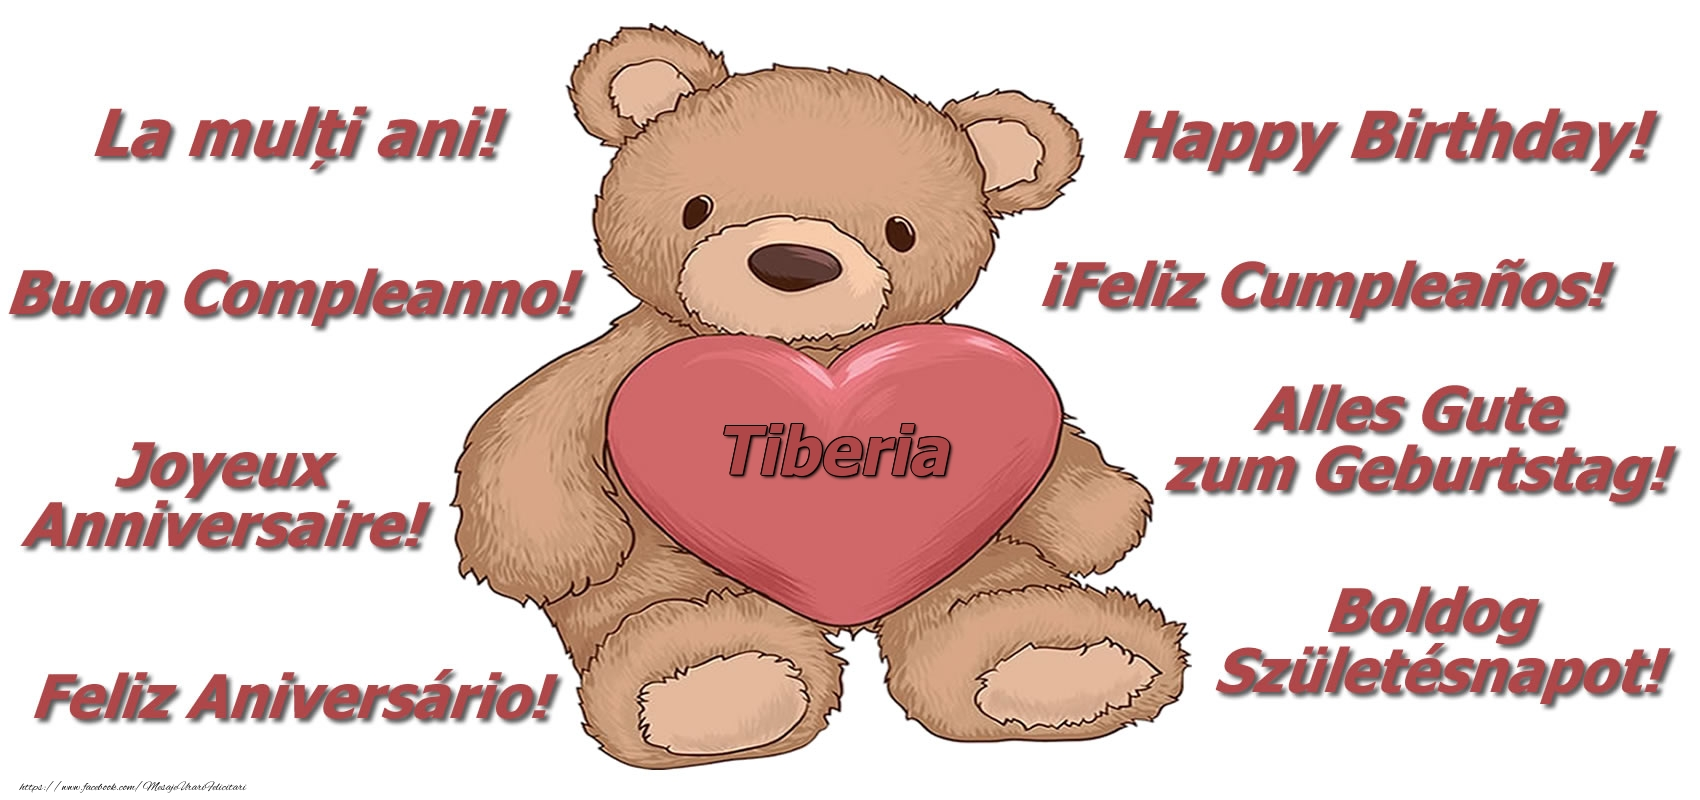 Felicitari de zi de nastere - La multi ani Tiberia! - Ursulet